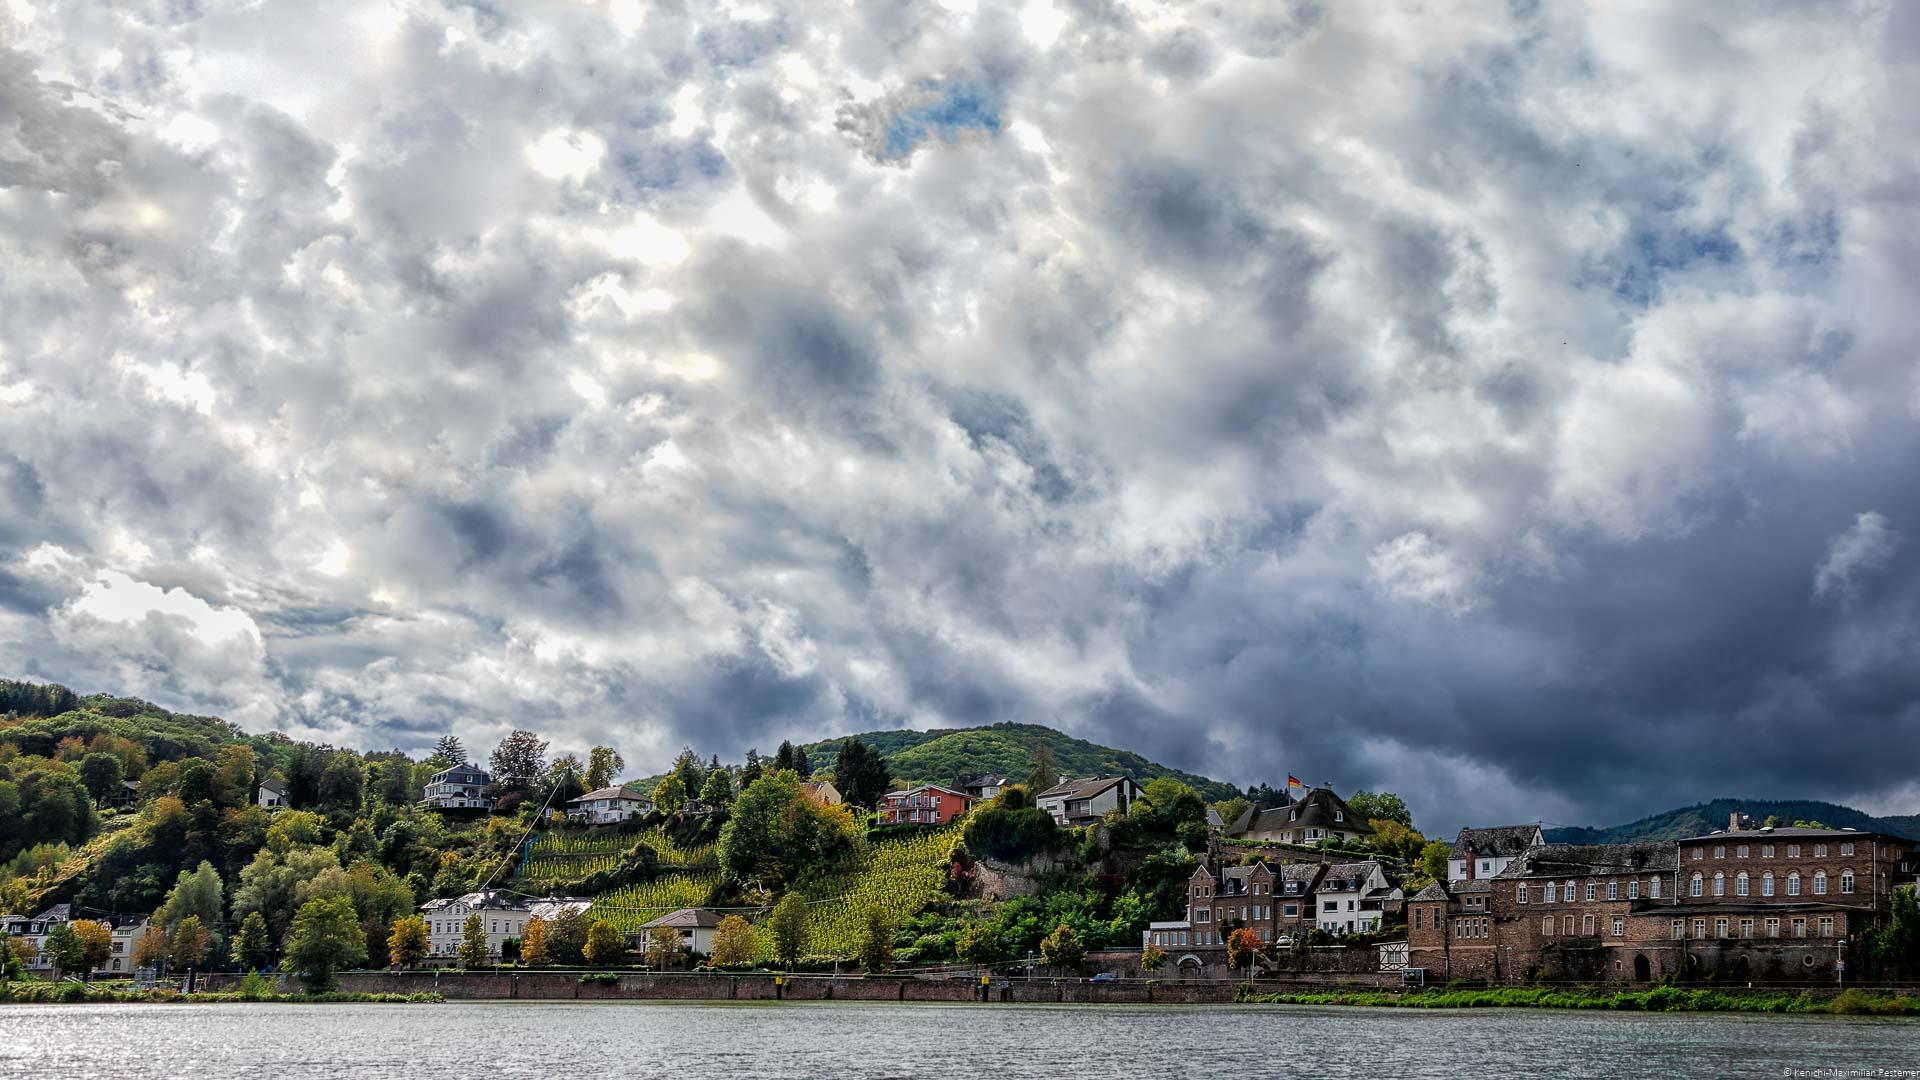 Alfer Hoelle Landschaft Urlaub Fine Art